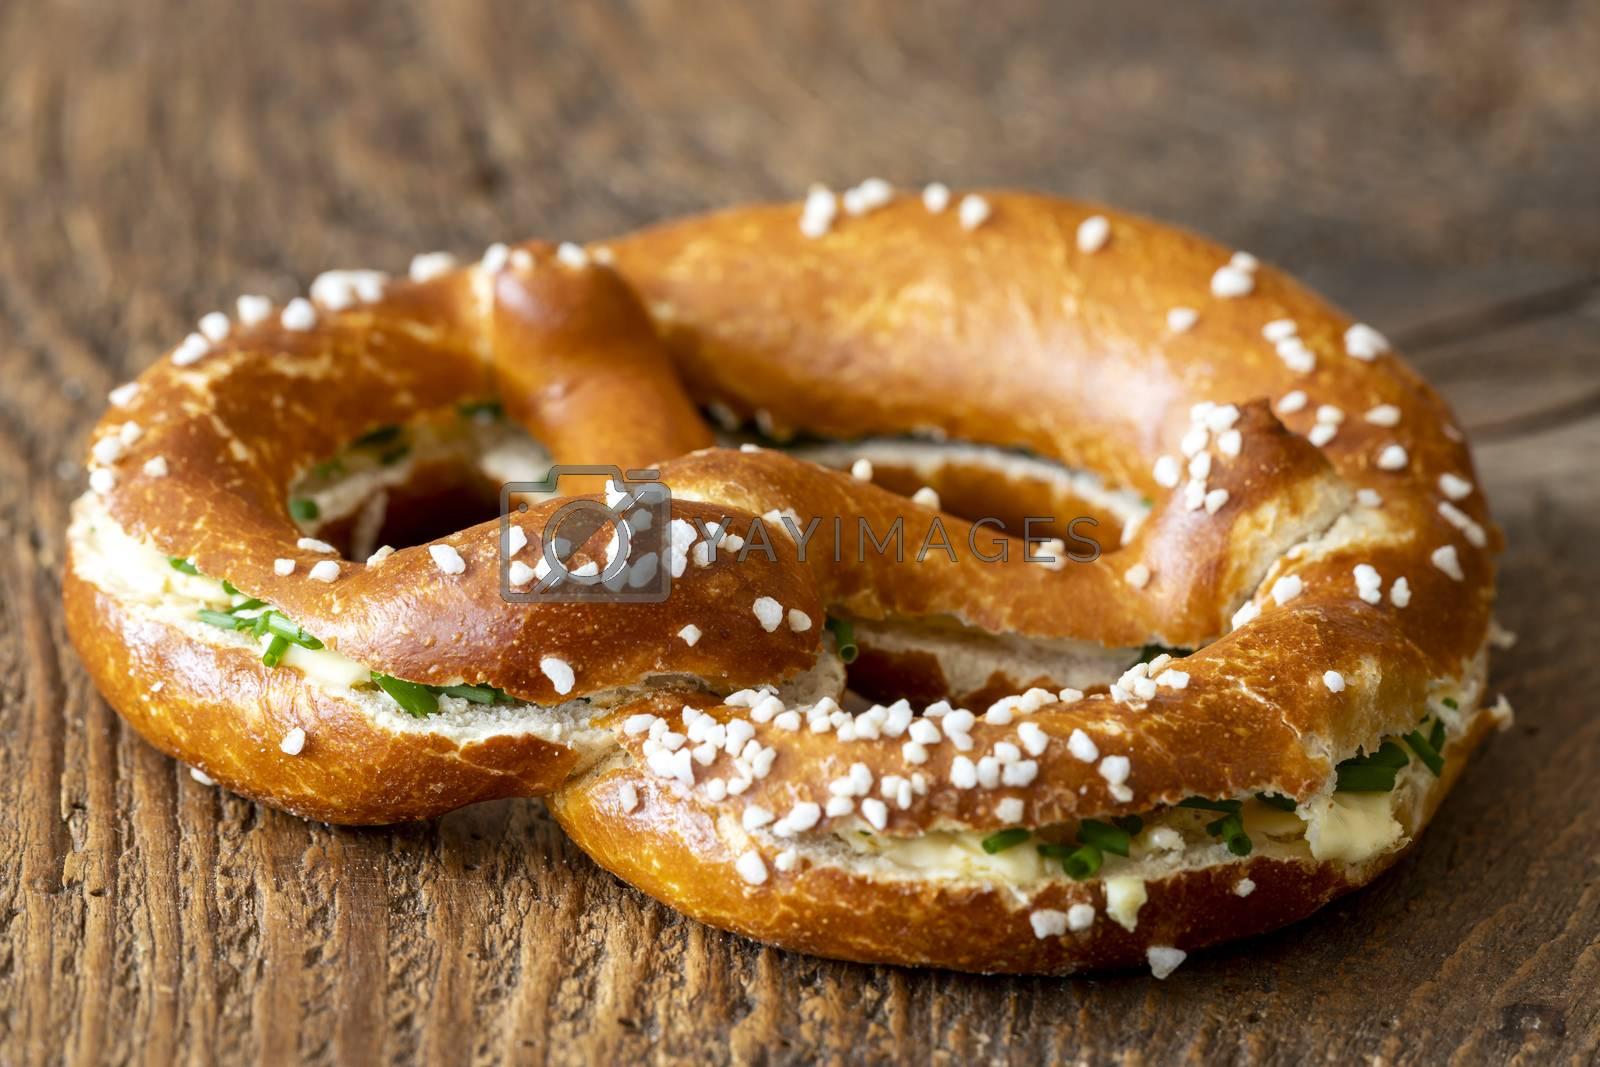 bavarian pretzel with butter on wood